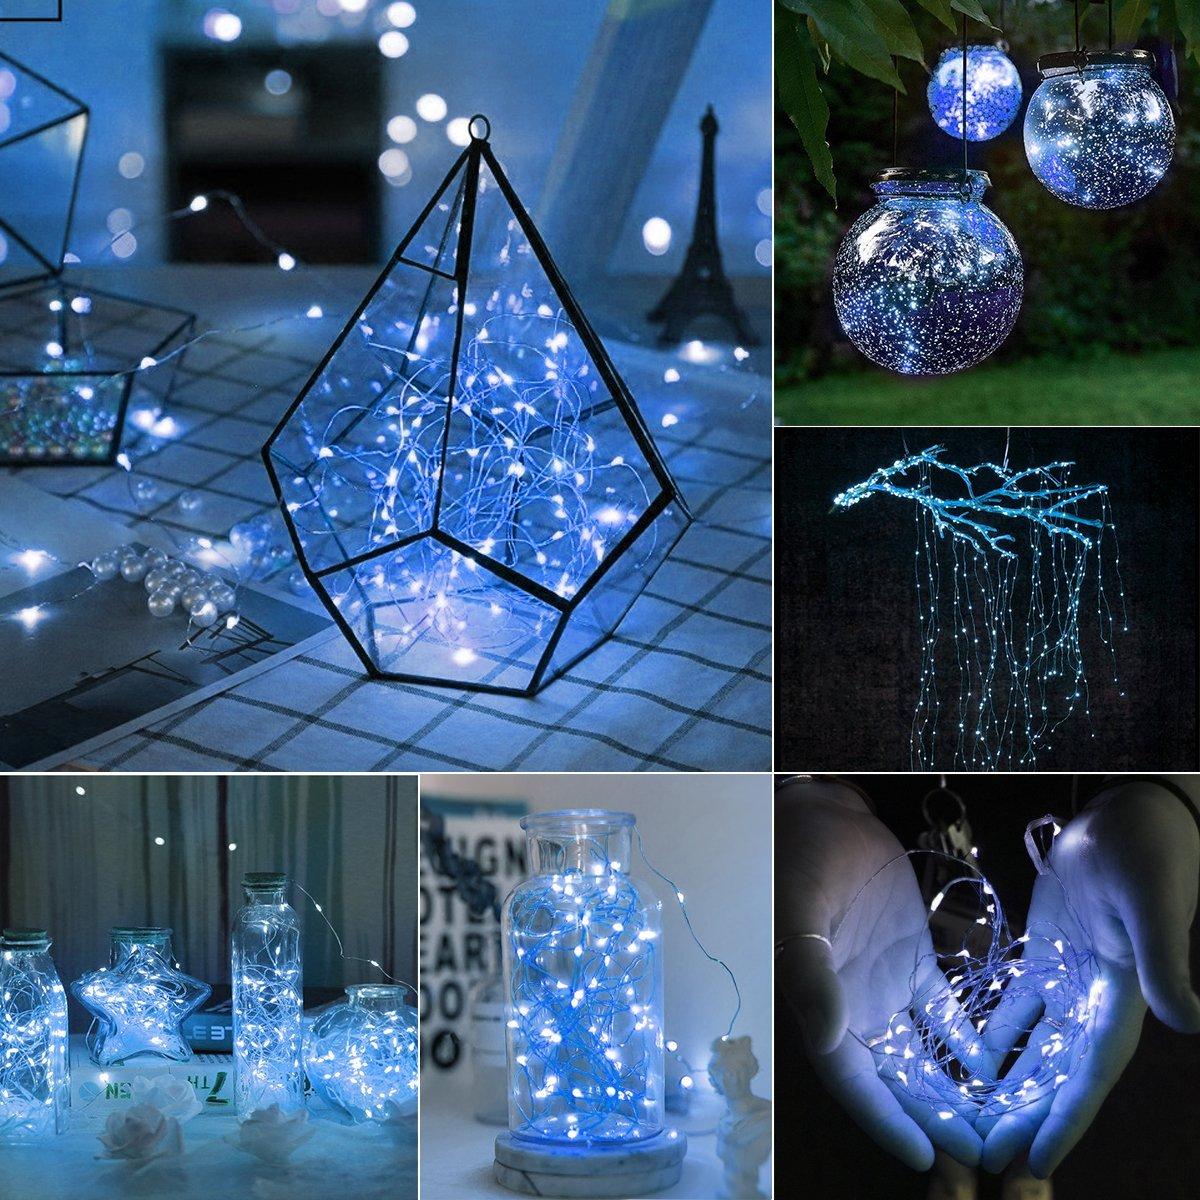 Amazon.com: innotree 3 Pack Fairy Lights, 8ft 20 LED String Lights ...